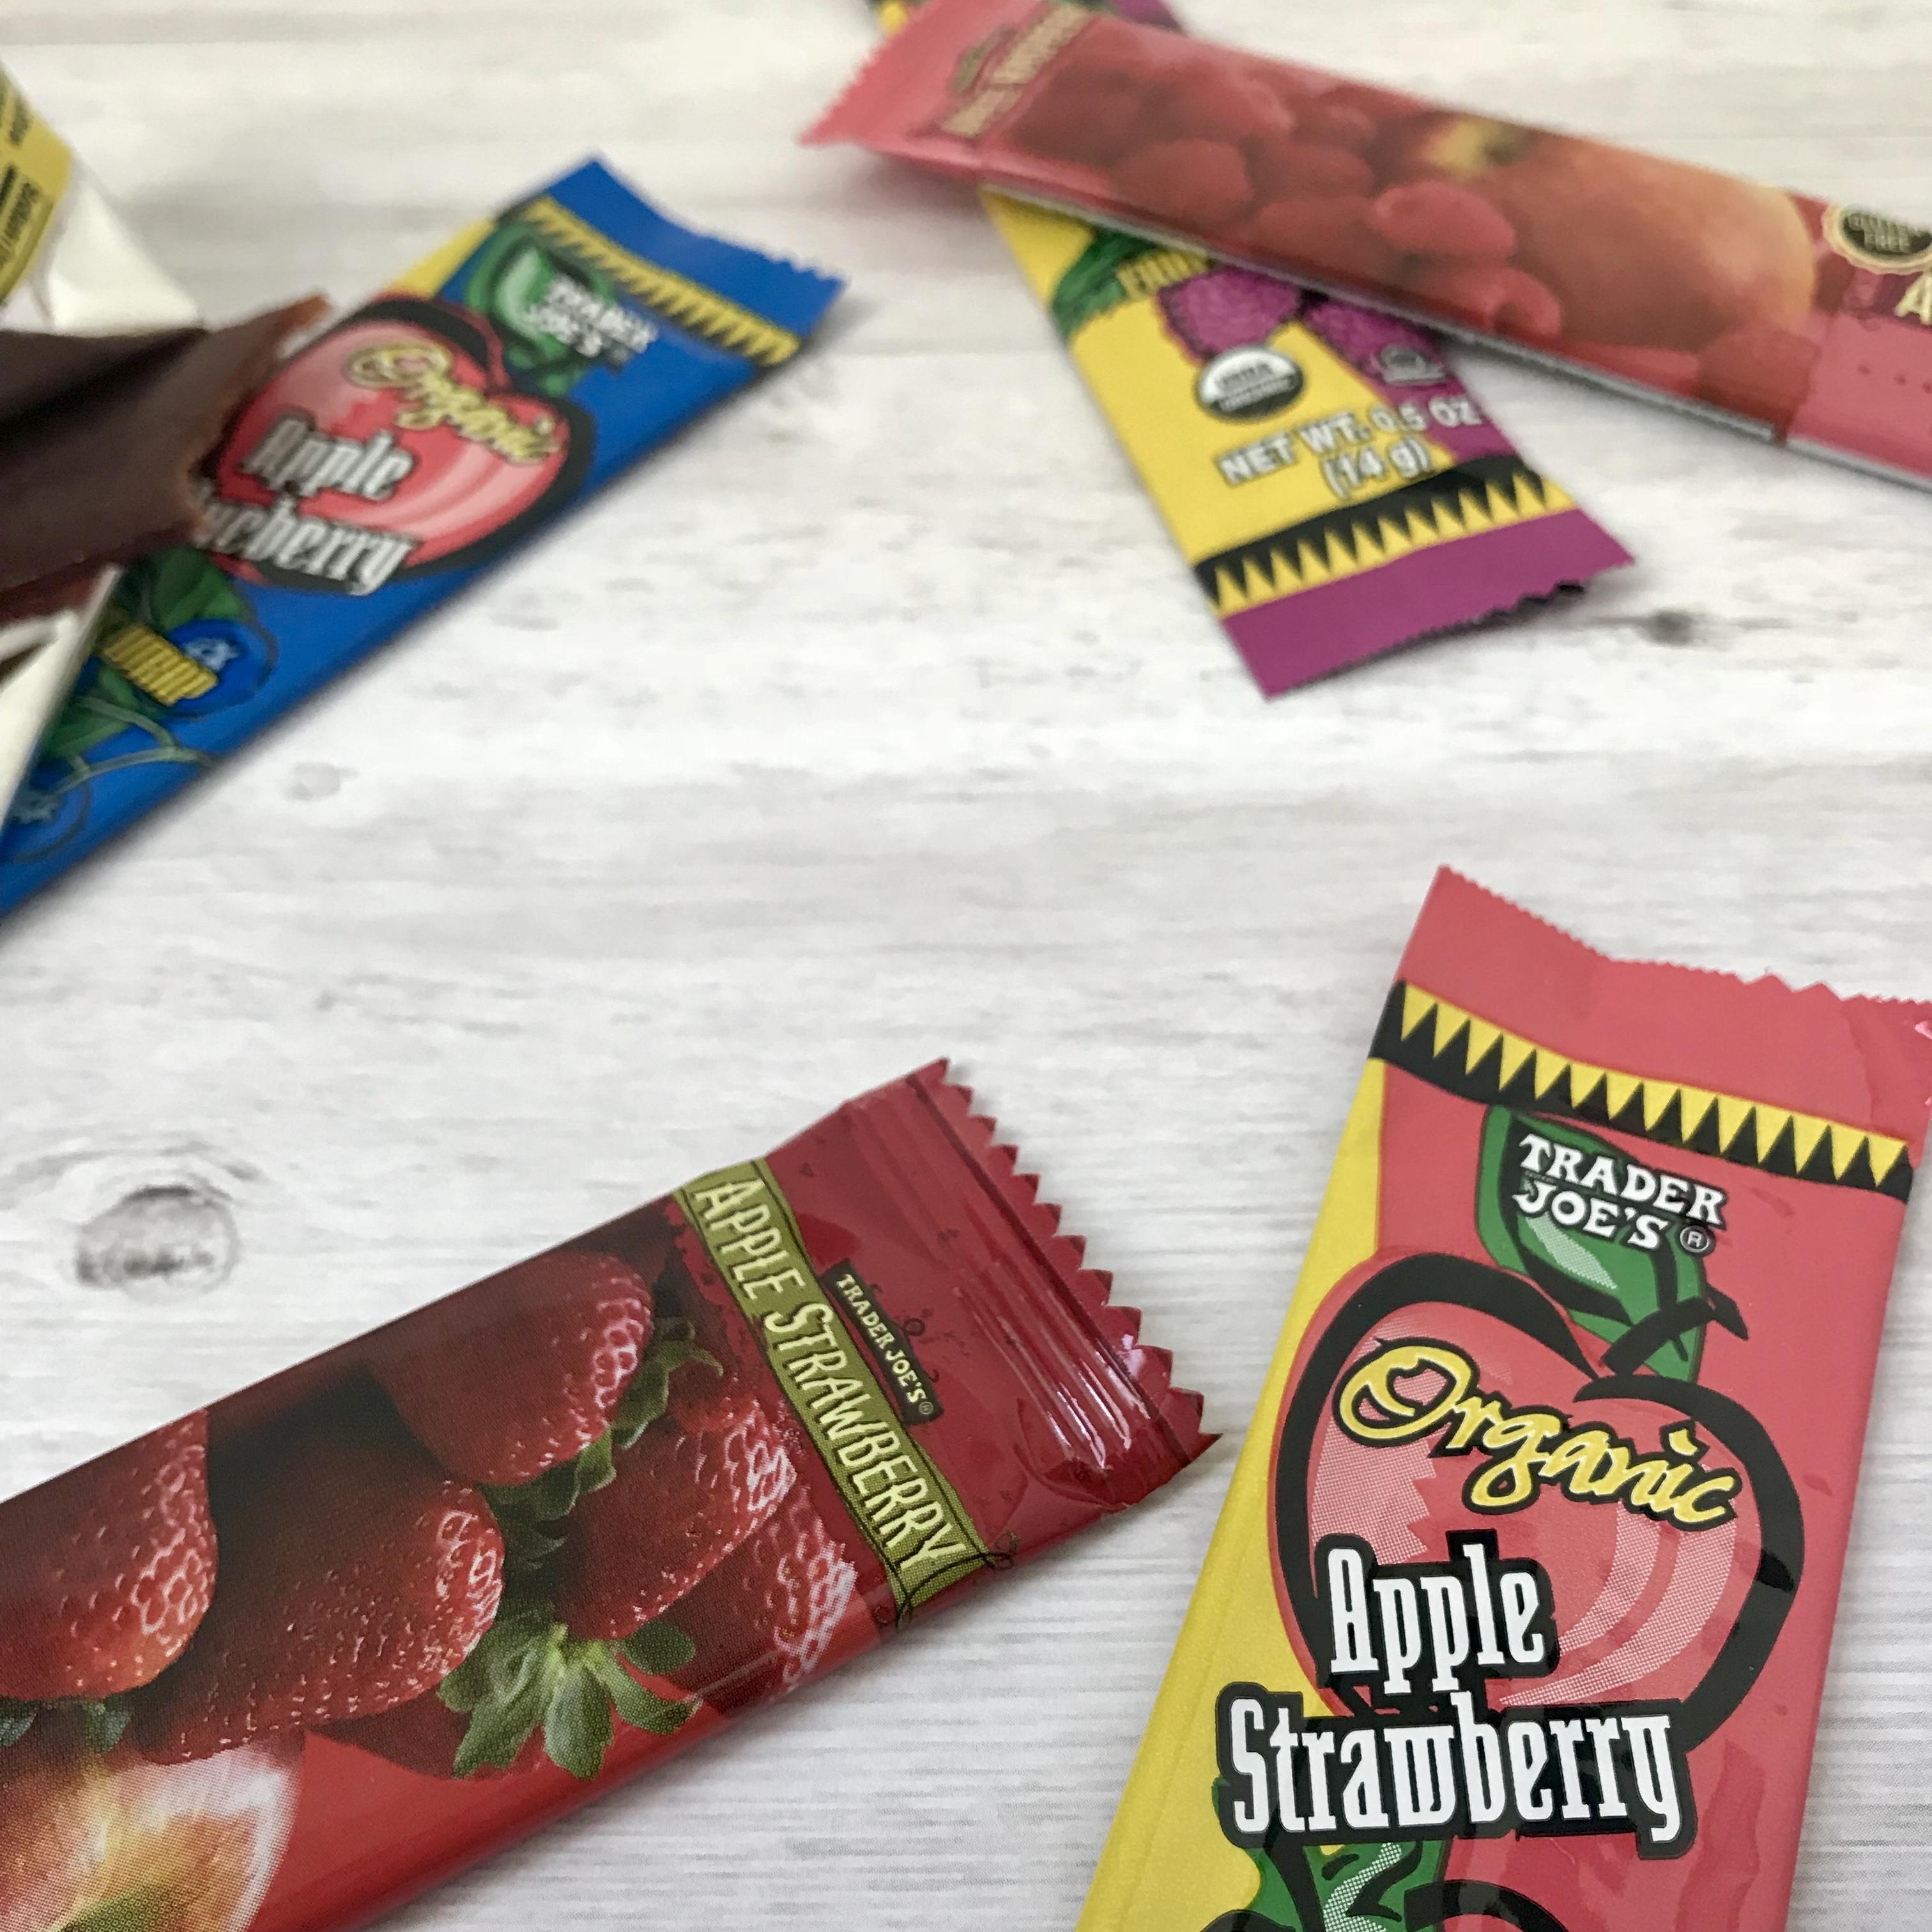 fruit leather, fruit bars, organic fruit strips, trader joe's organic fruit leather